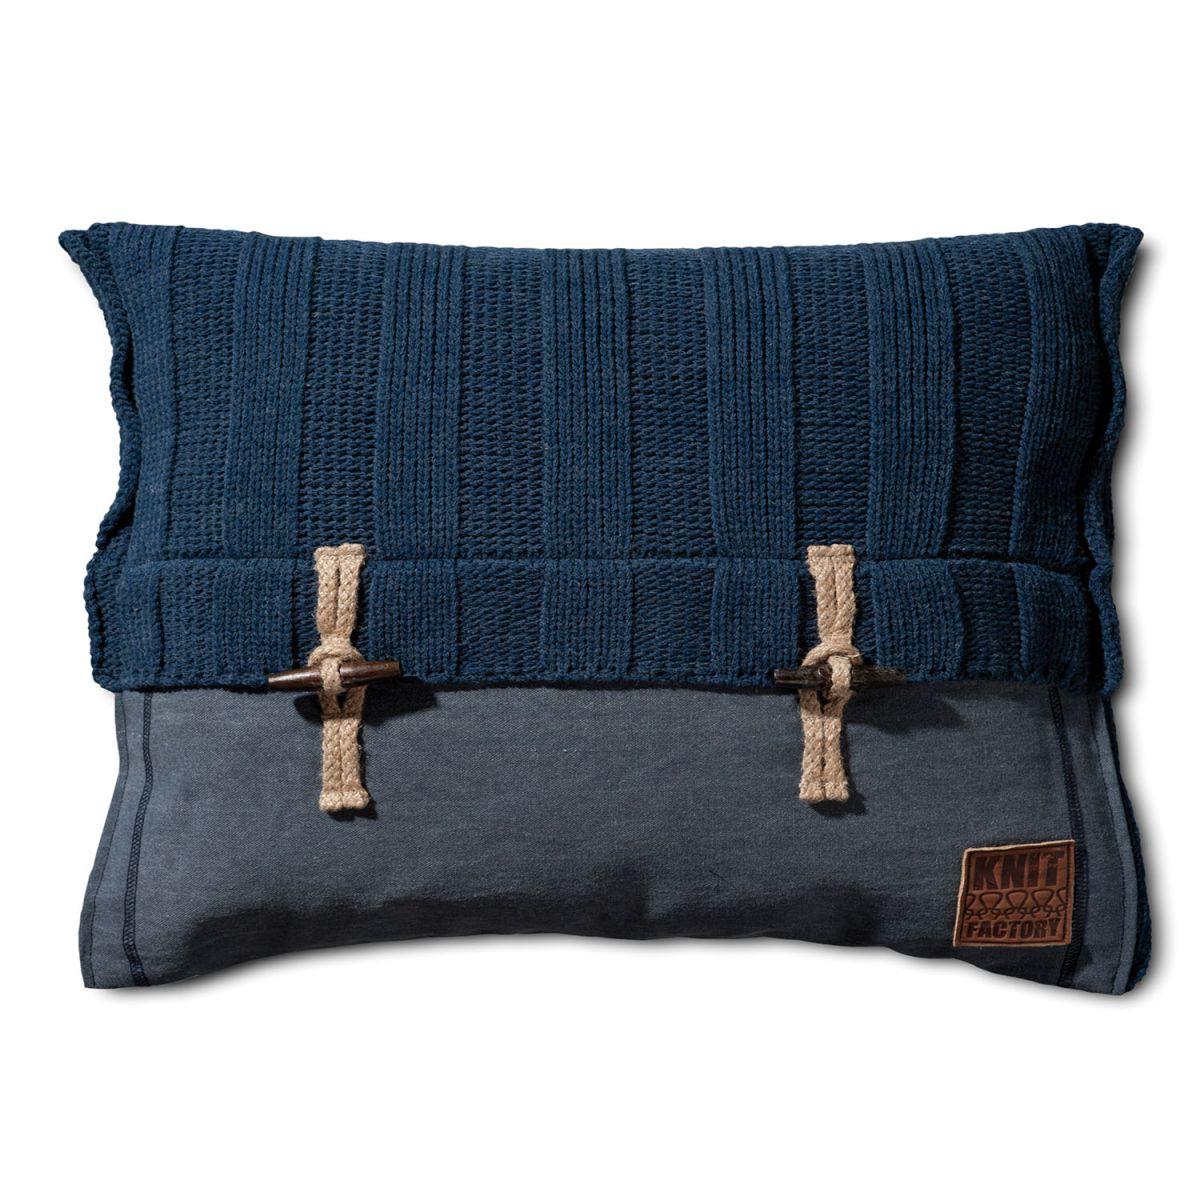 6x6 rib cushion jeans 60x40